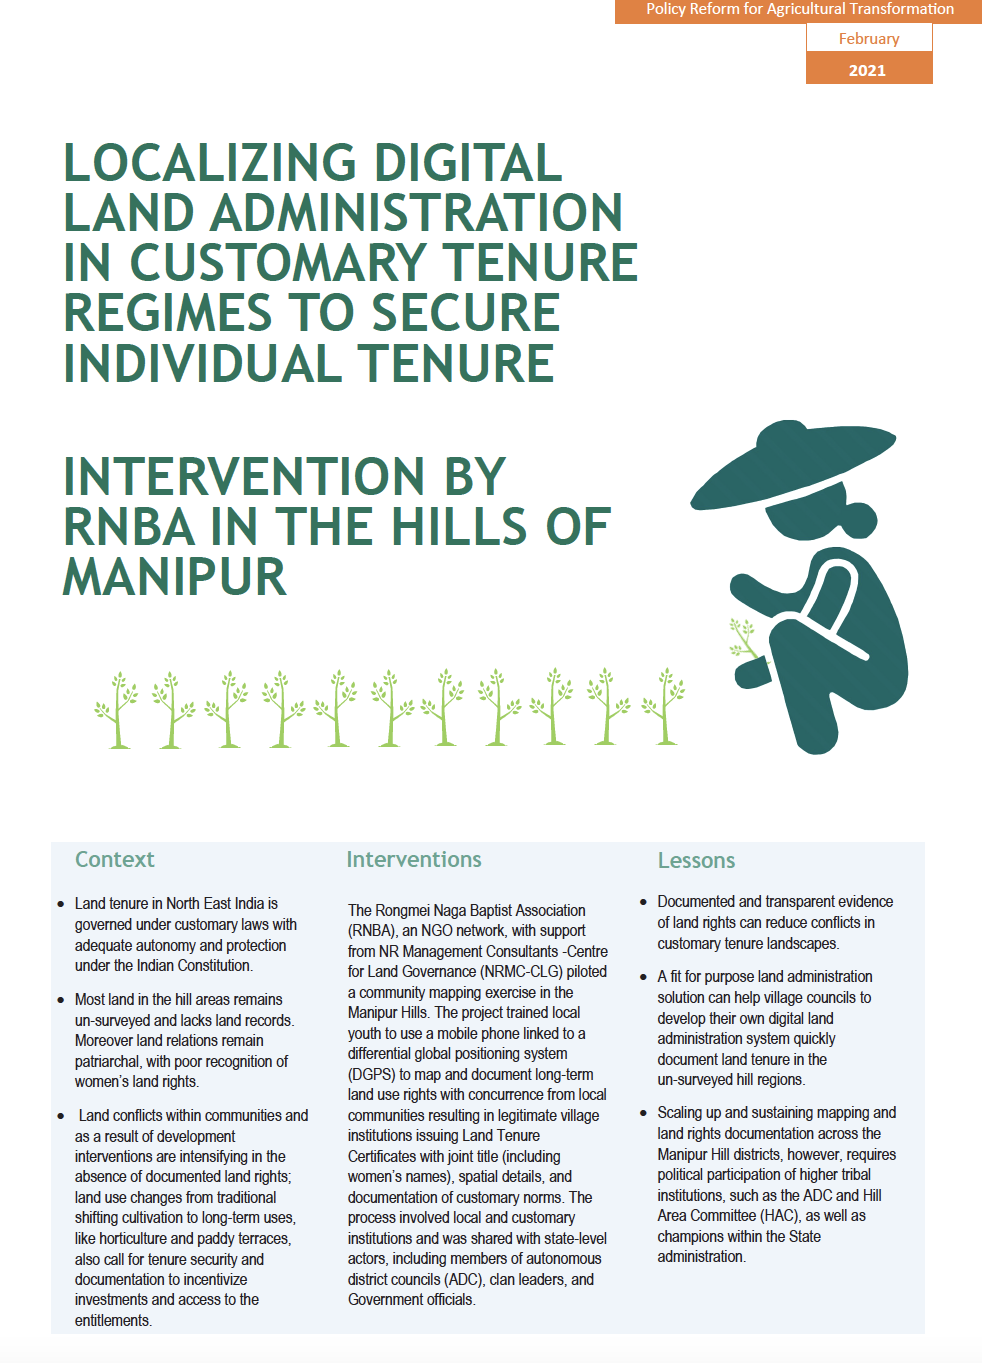 Localizing Digital Land Administration in Customary Tenure Regimes to Secure Individual Tenure